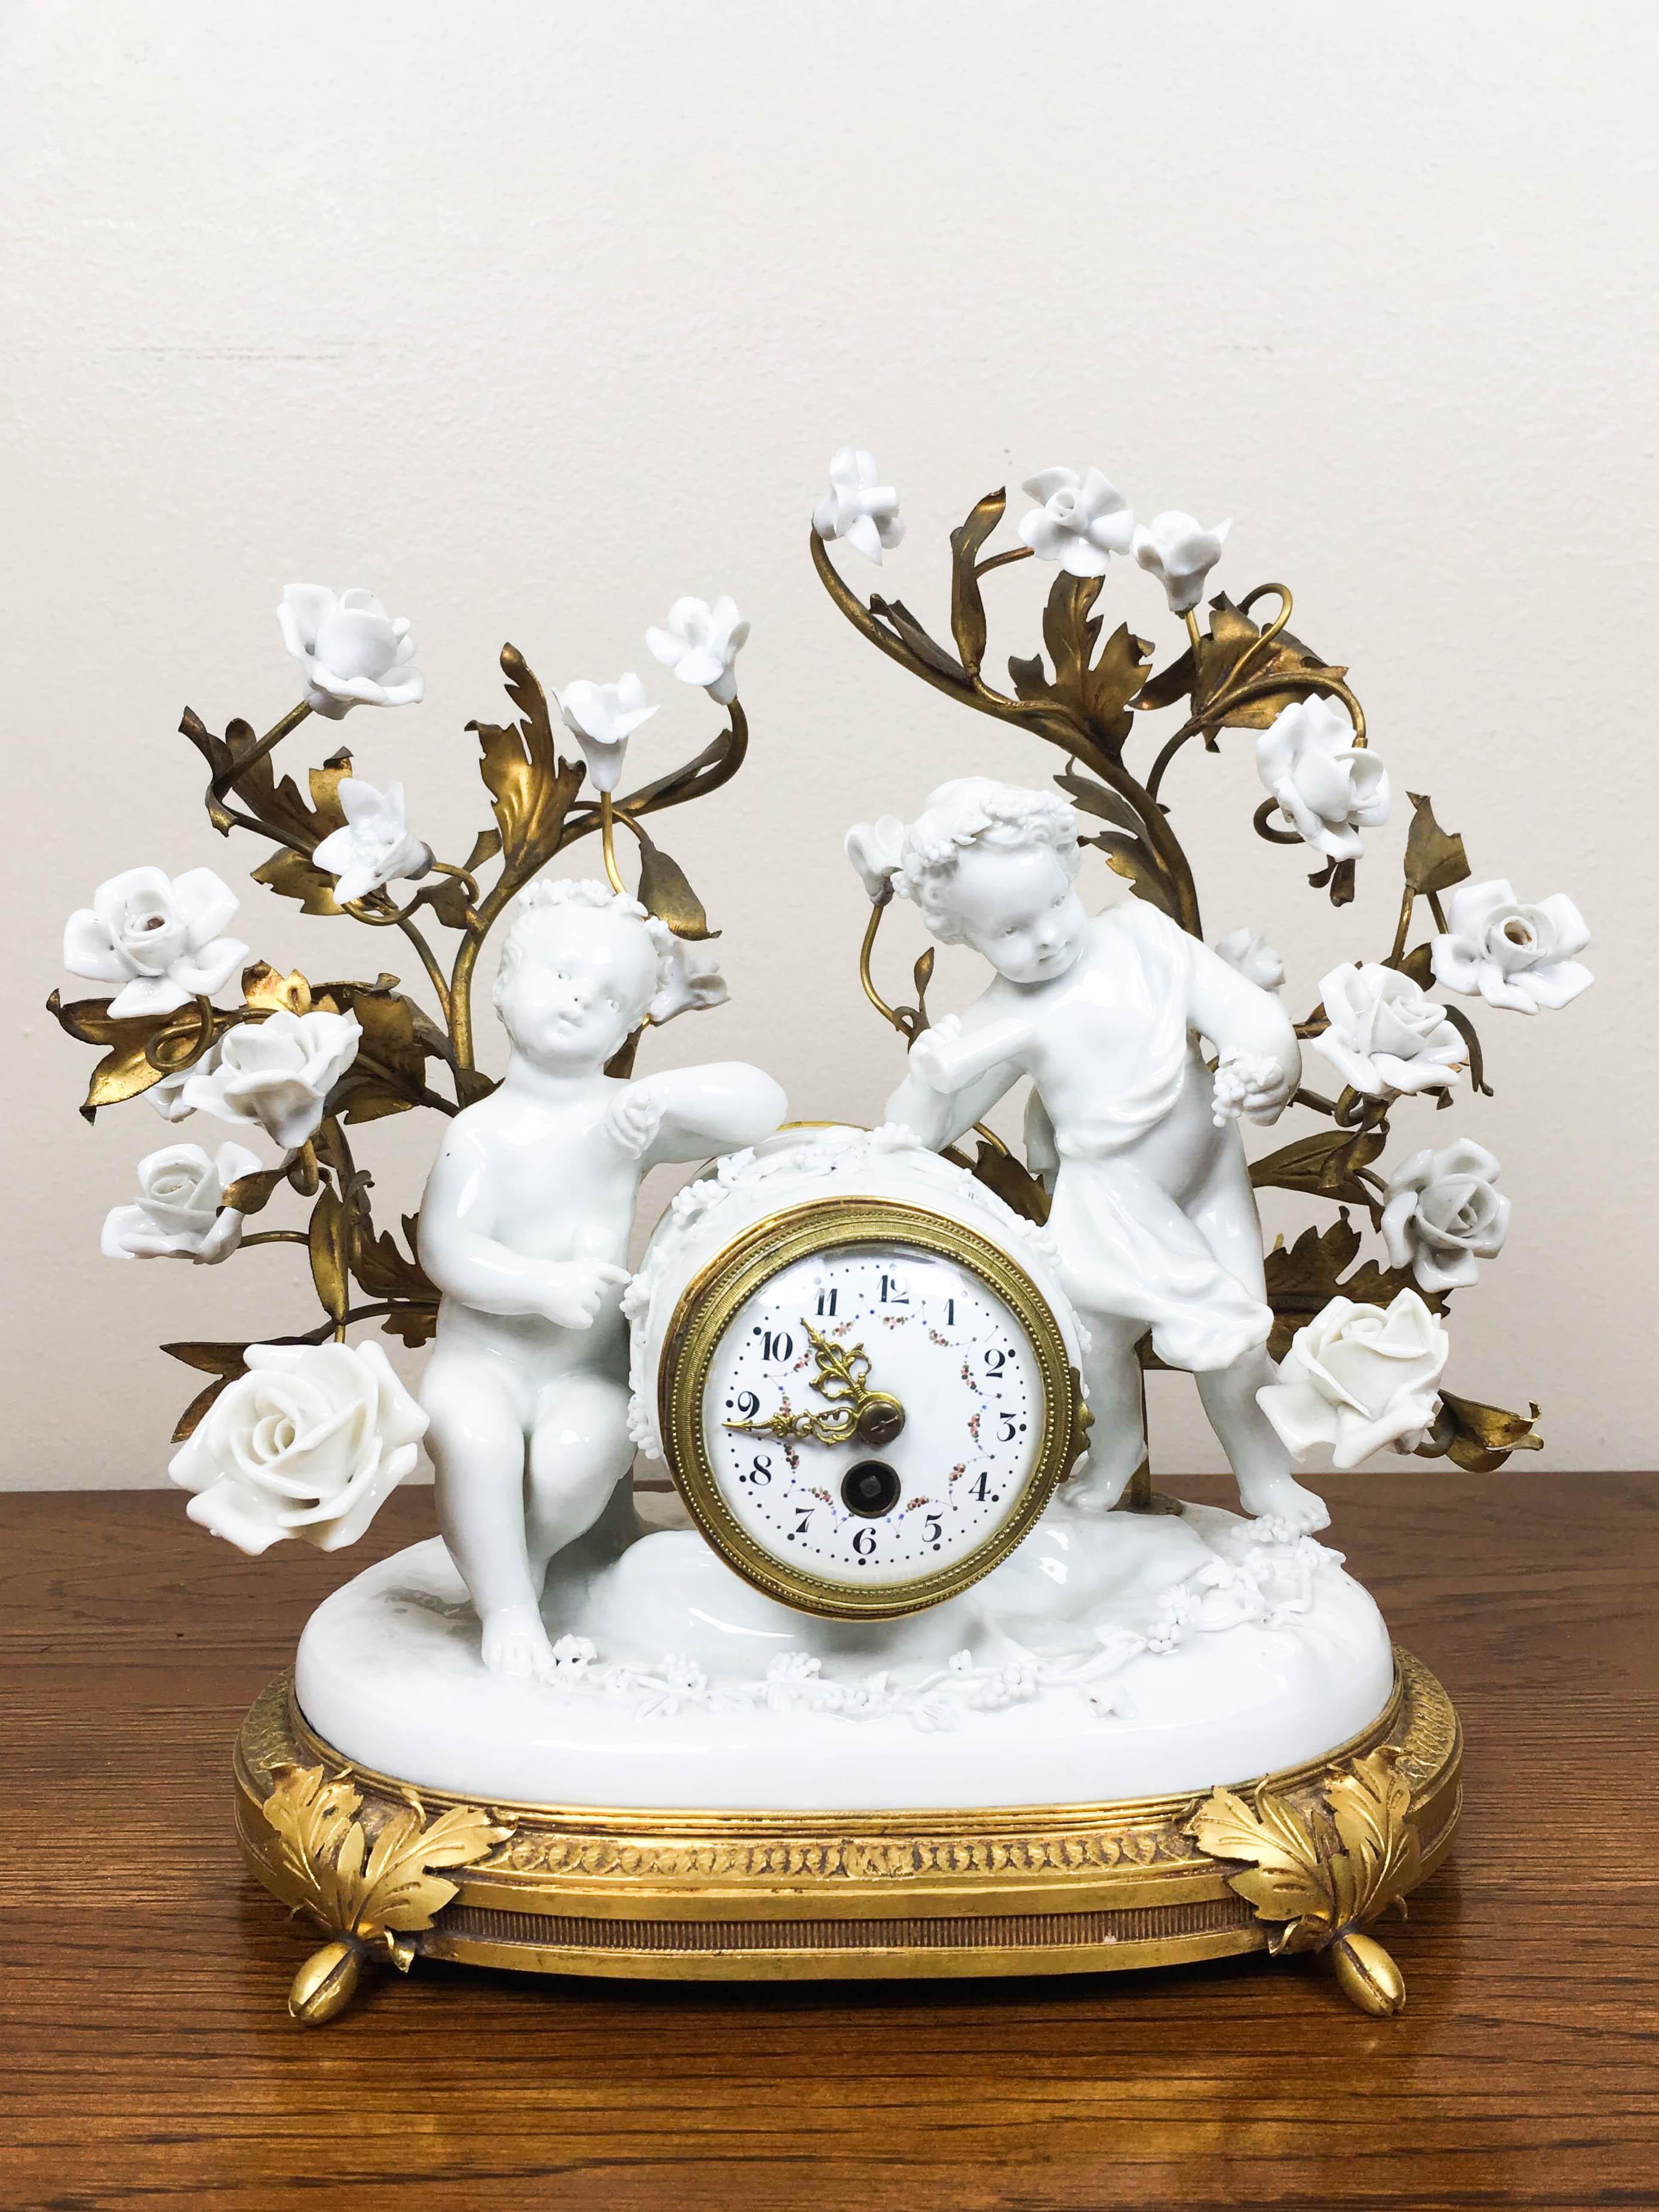 19th Century Capodimonte Porcelain Mantel, France